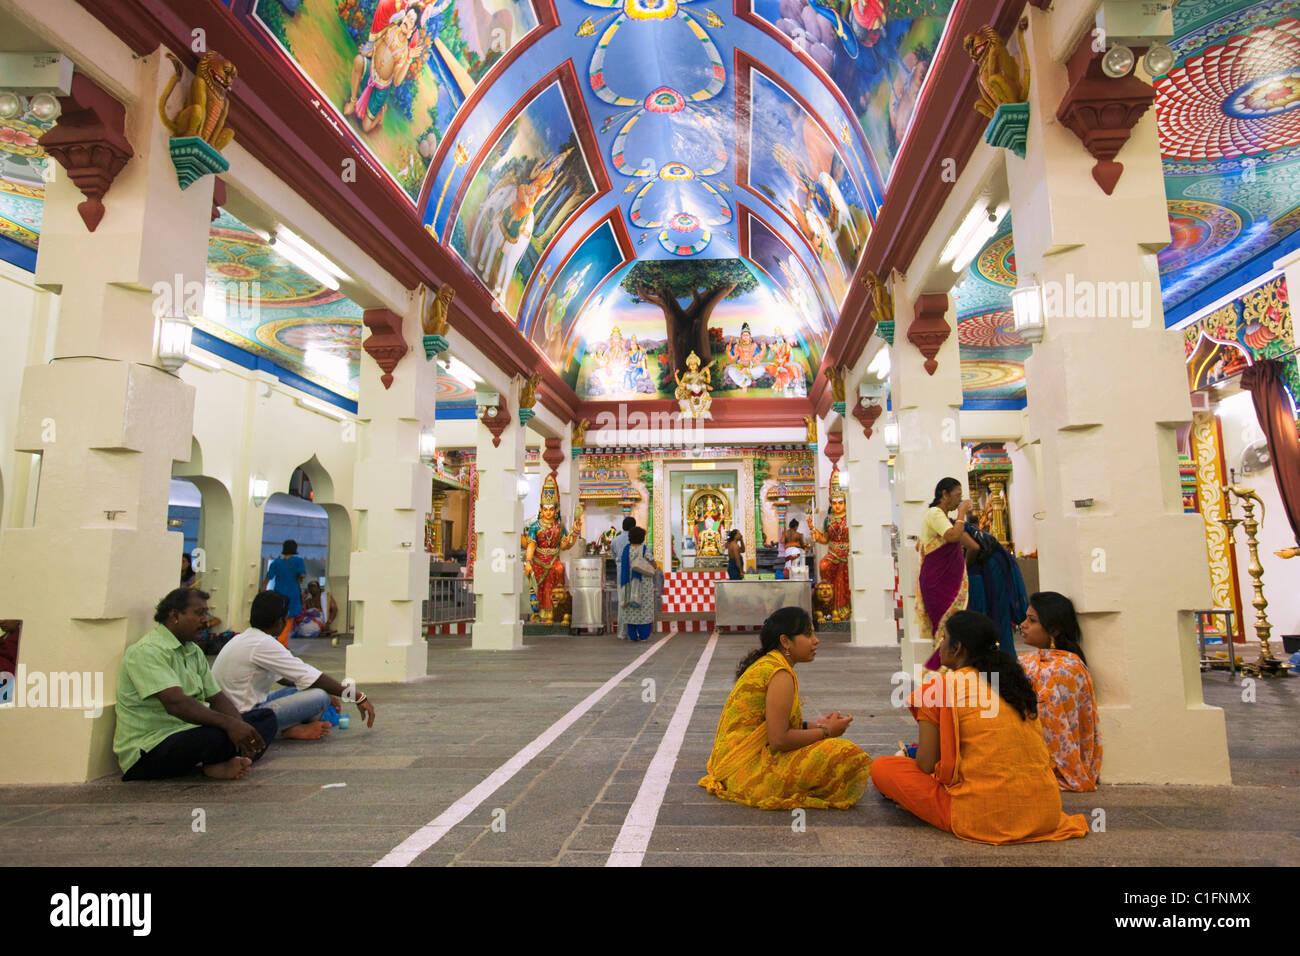 Colourful interior of the Sri Mariamman Hindu Temple.  Chinatown, Singapore - Stock Image